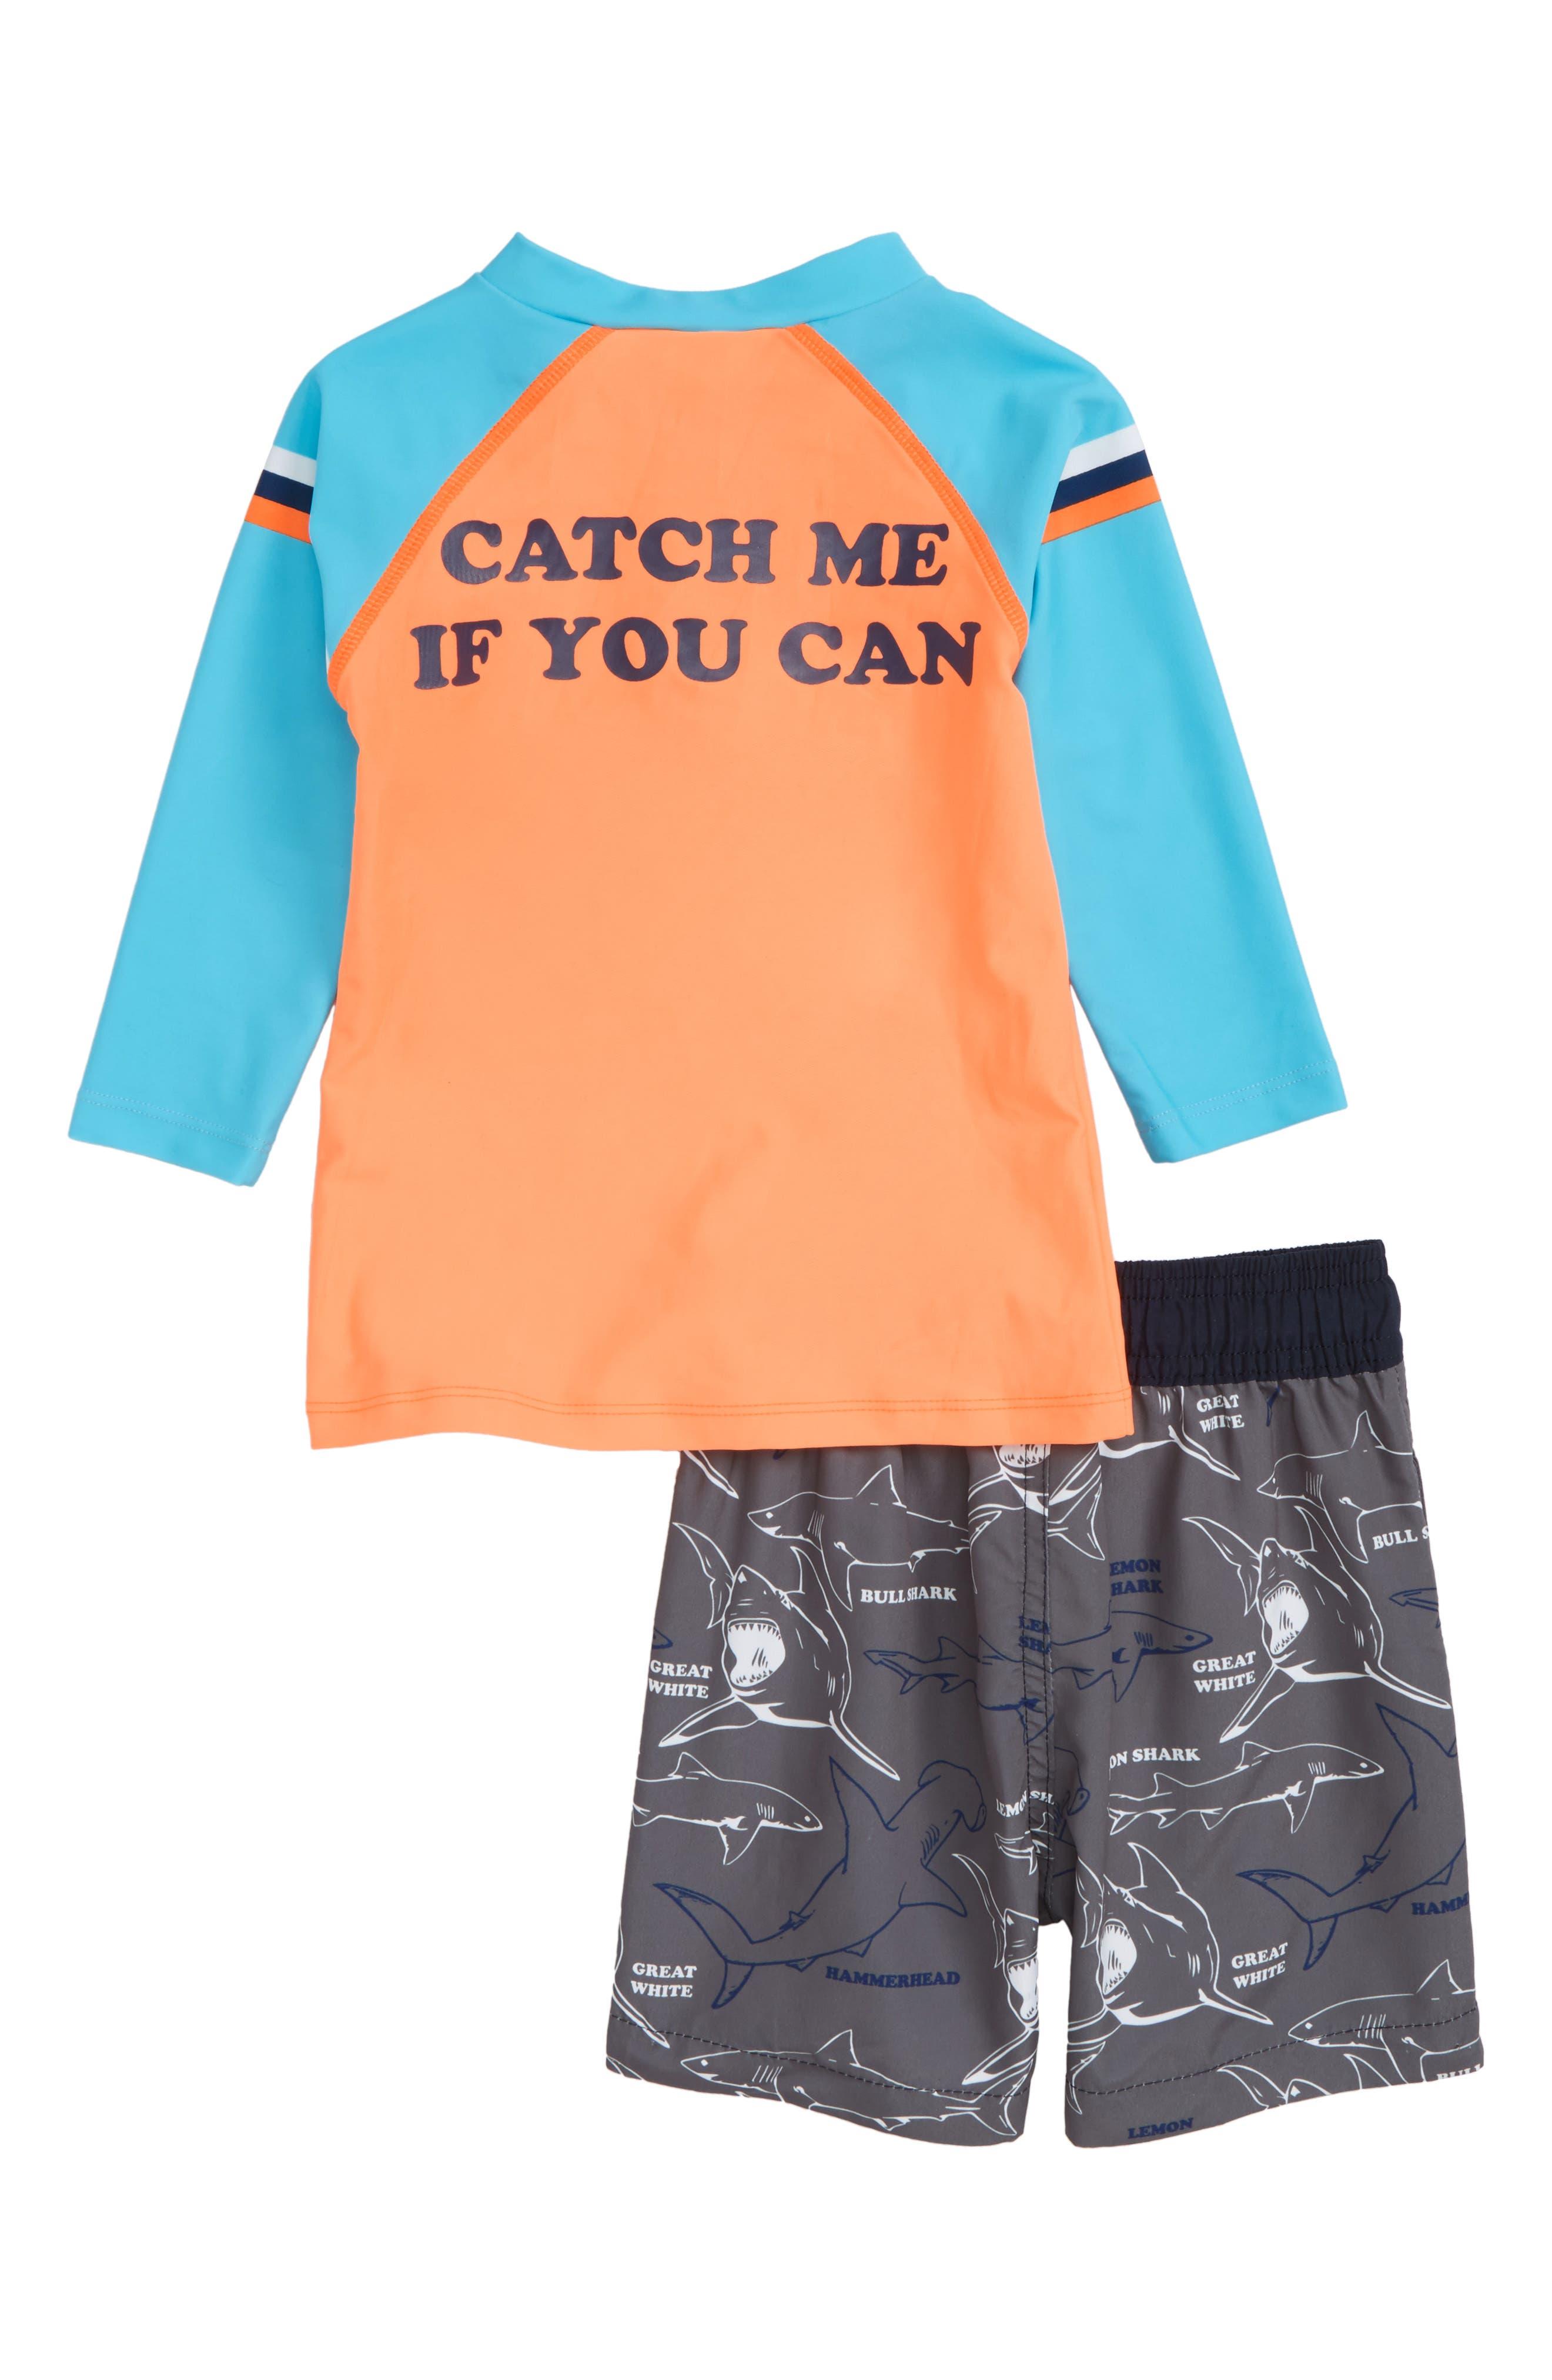 Catch Me if You Can Two-Piece Rashguard Swimsuit,                             Alternate thumbnail 2, color,                             Orange